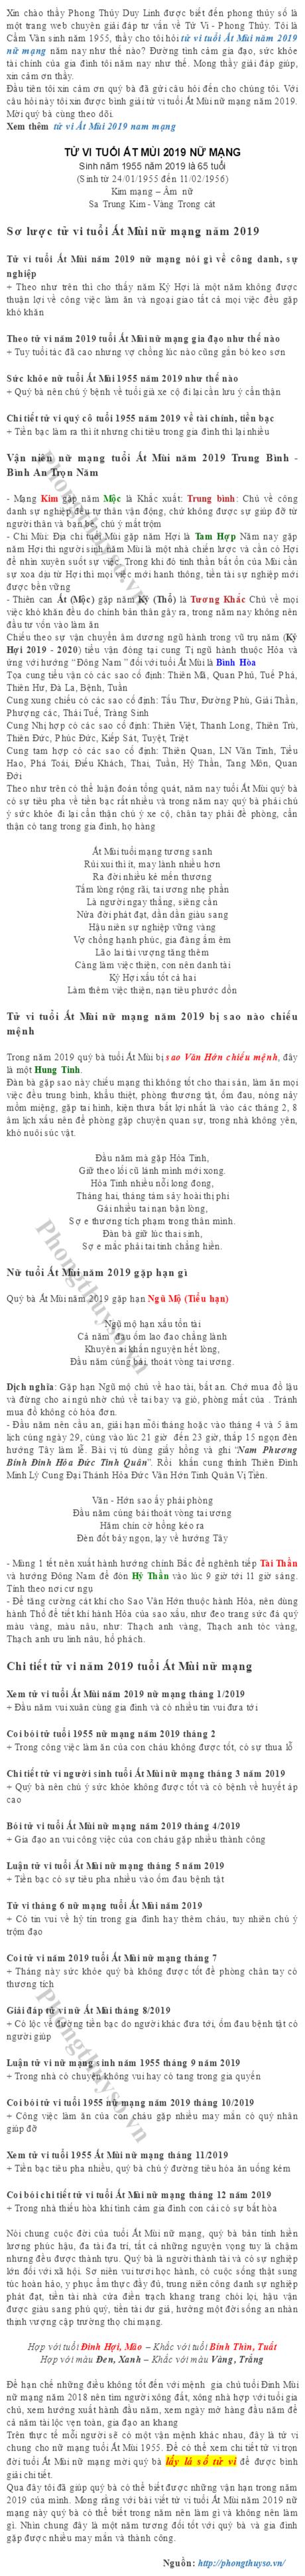 tu-vi-tuoi-at-mui-nam-2019-nu-mang